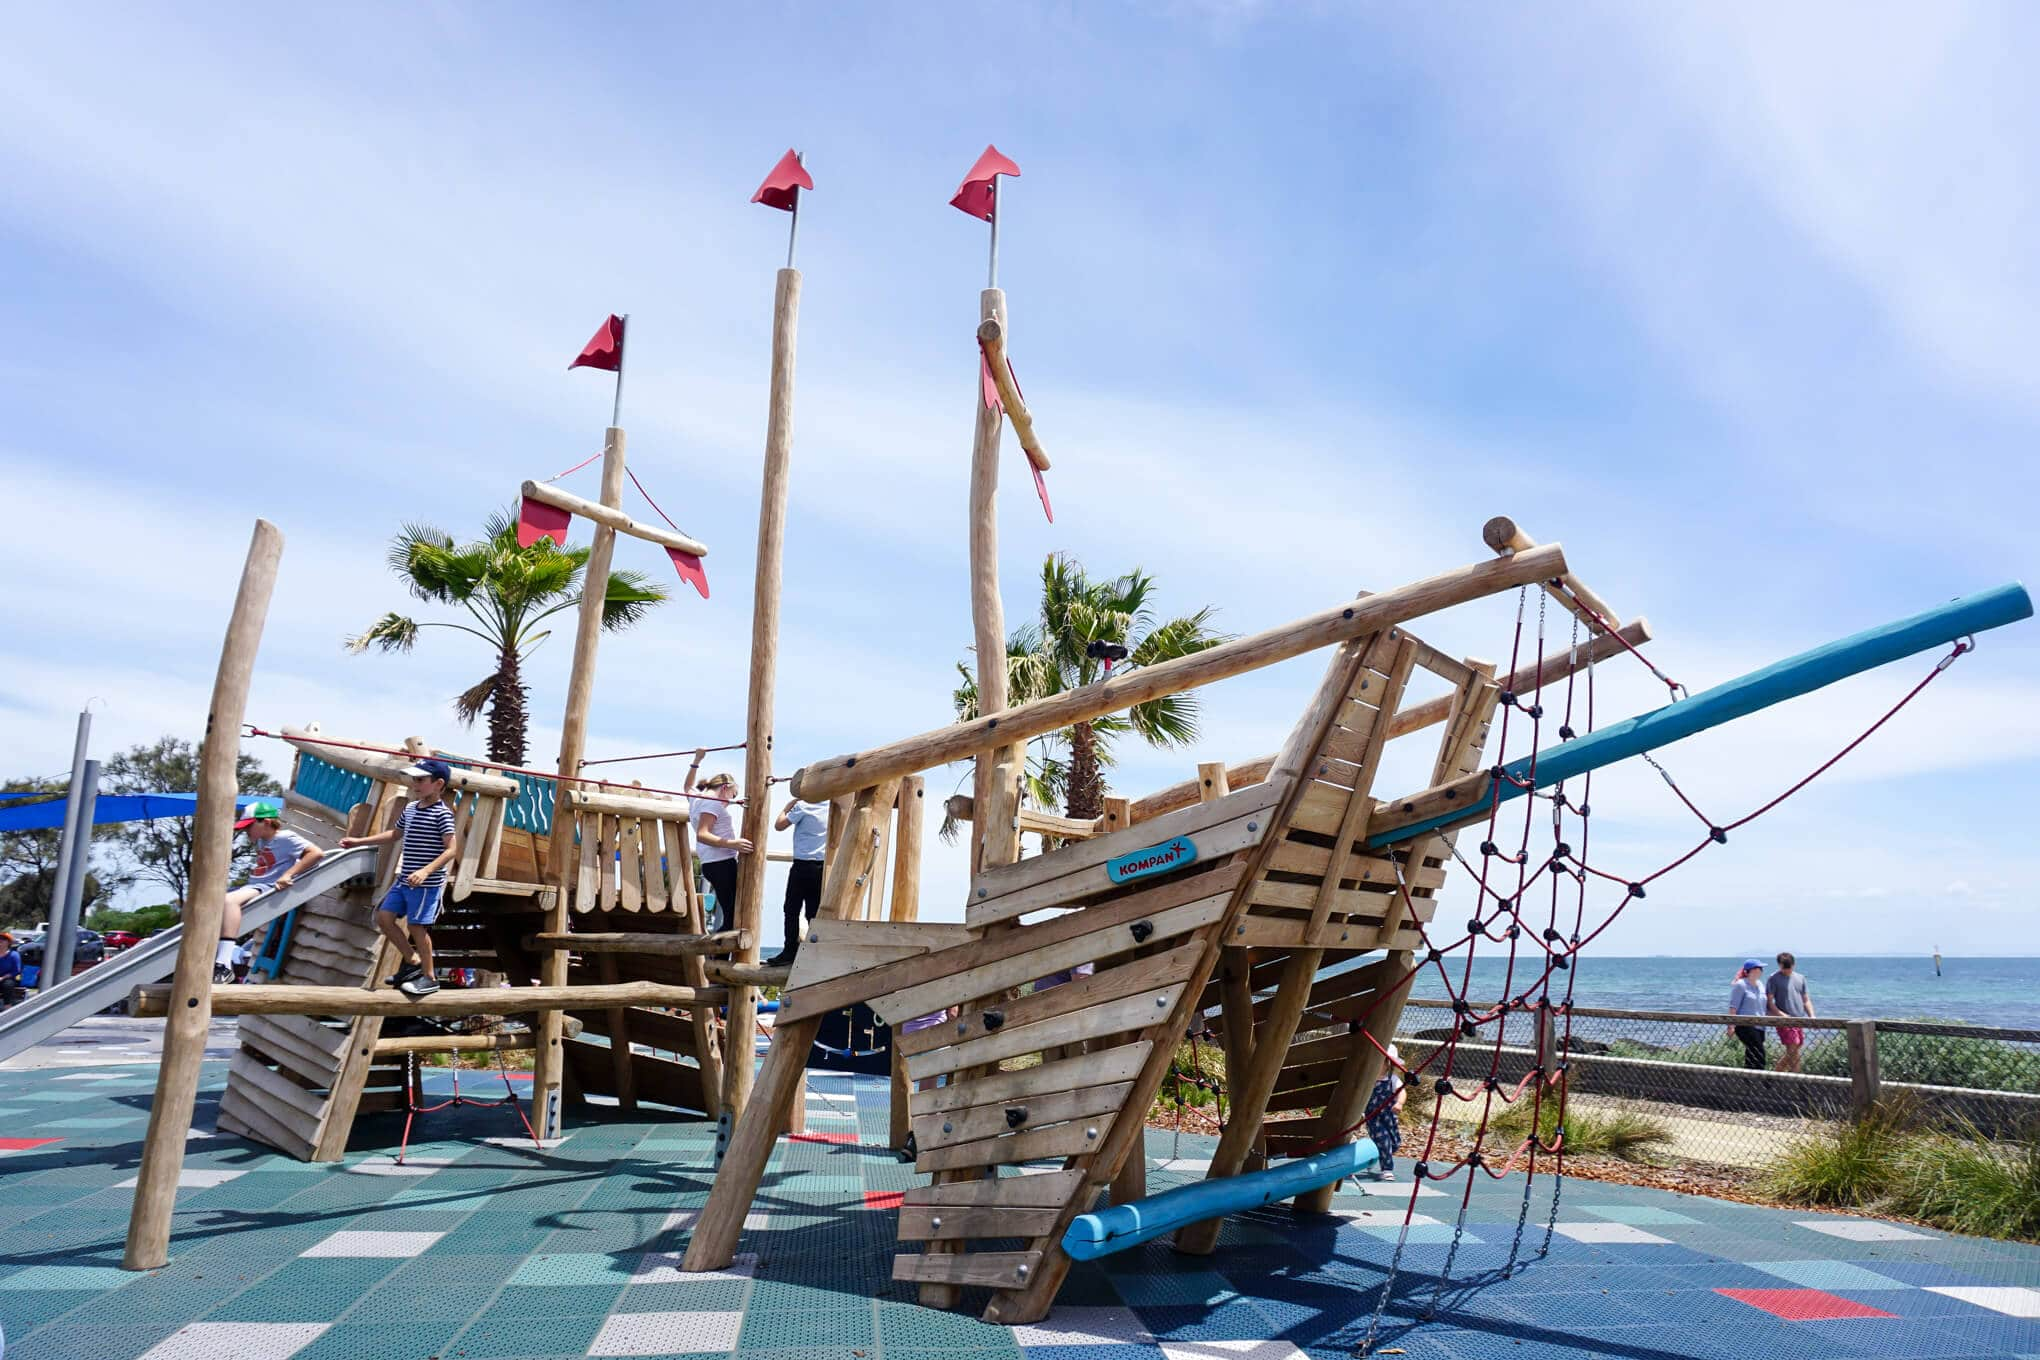 North Roadd Playground